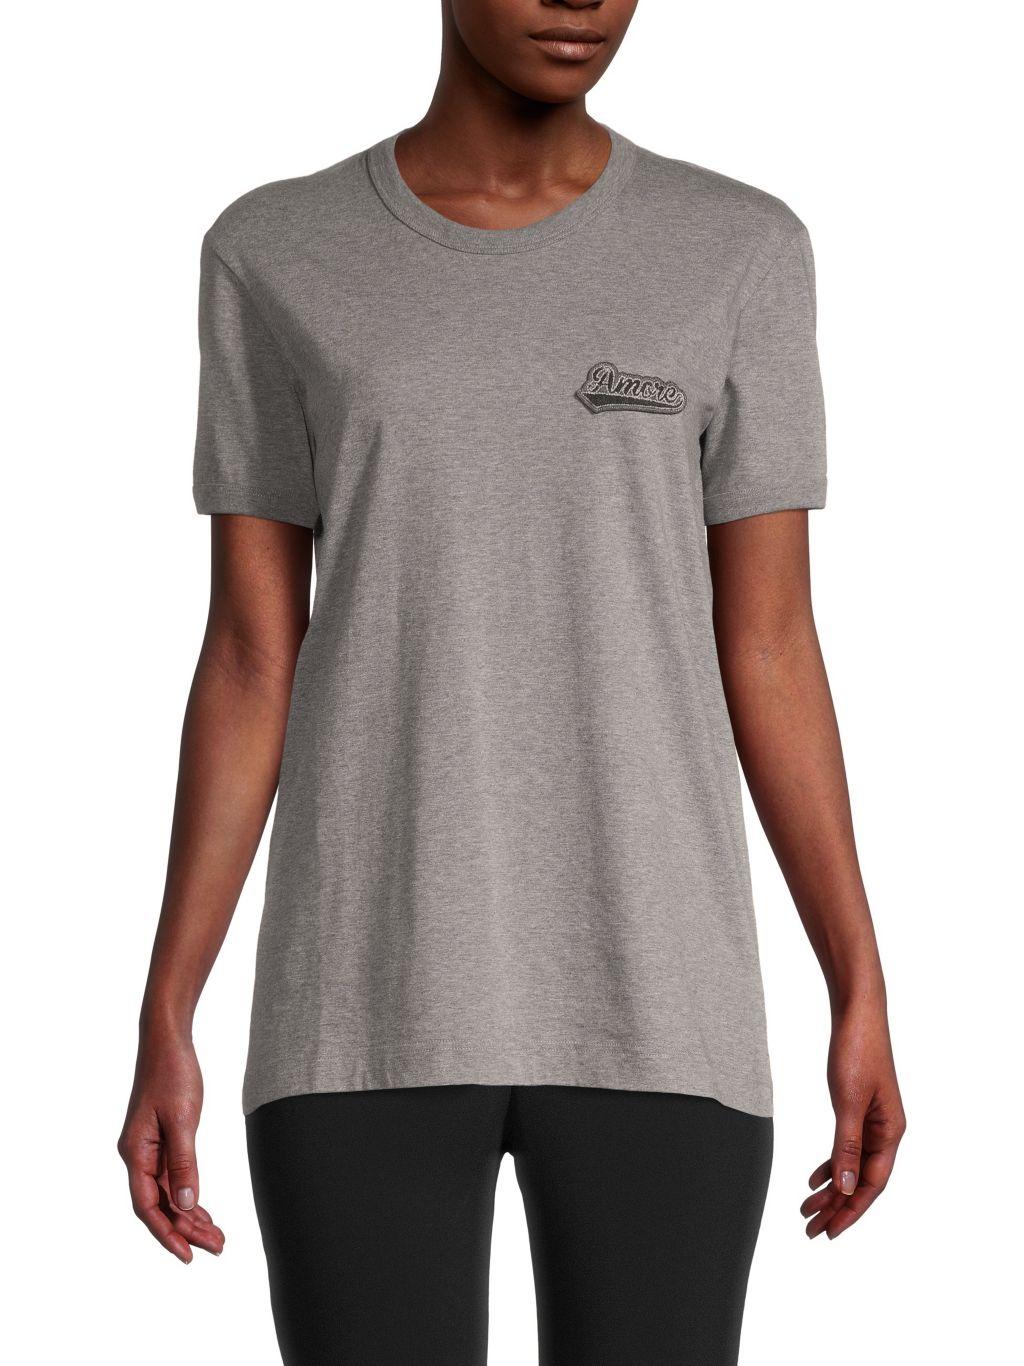 Dolce & Gabbana Amore Graphic T-Shirt